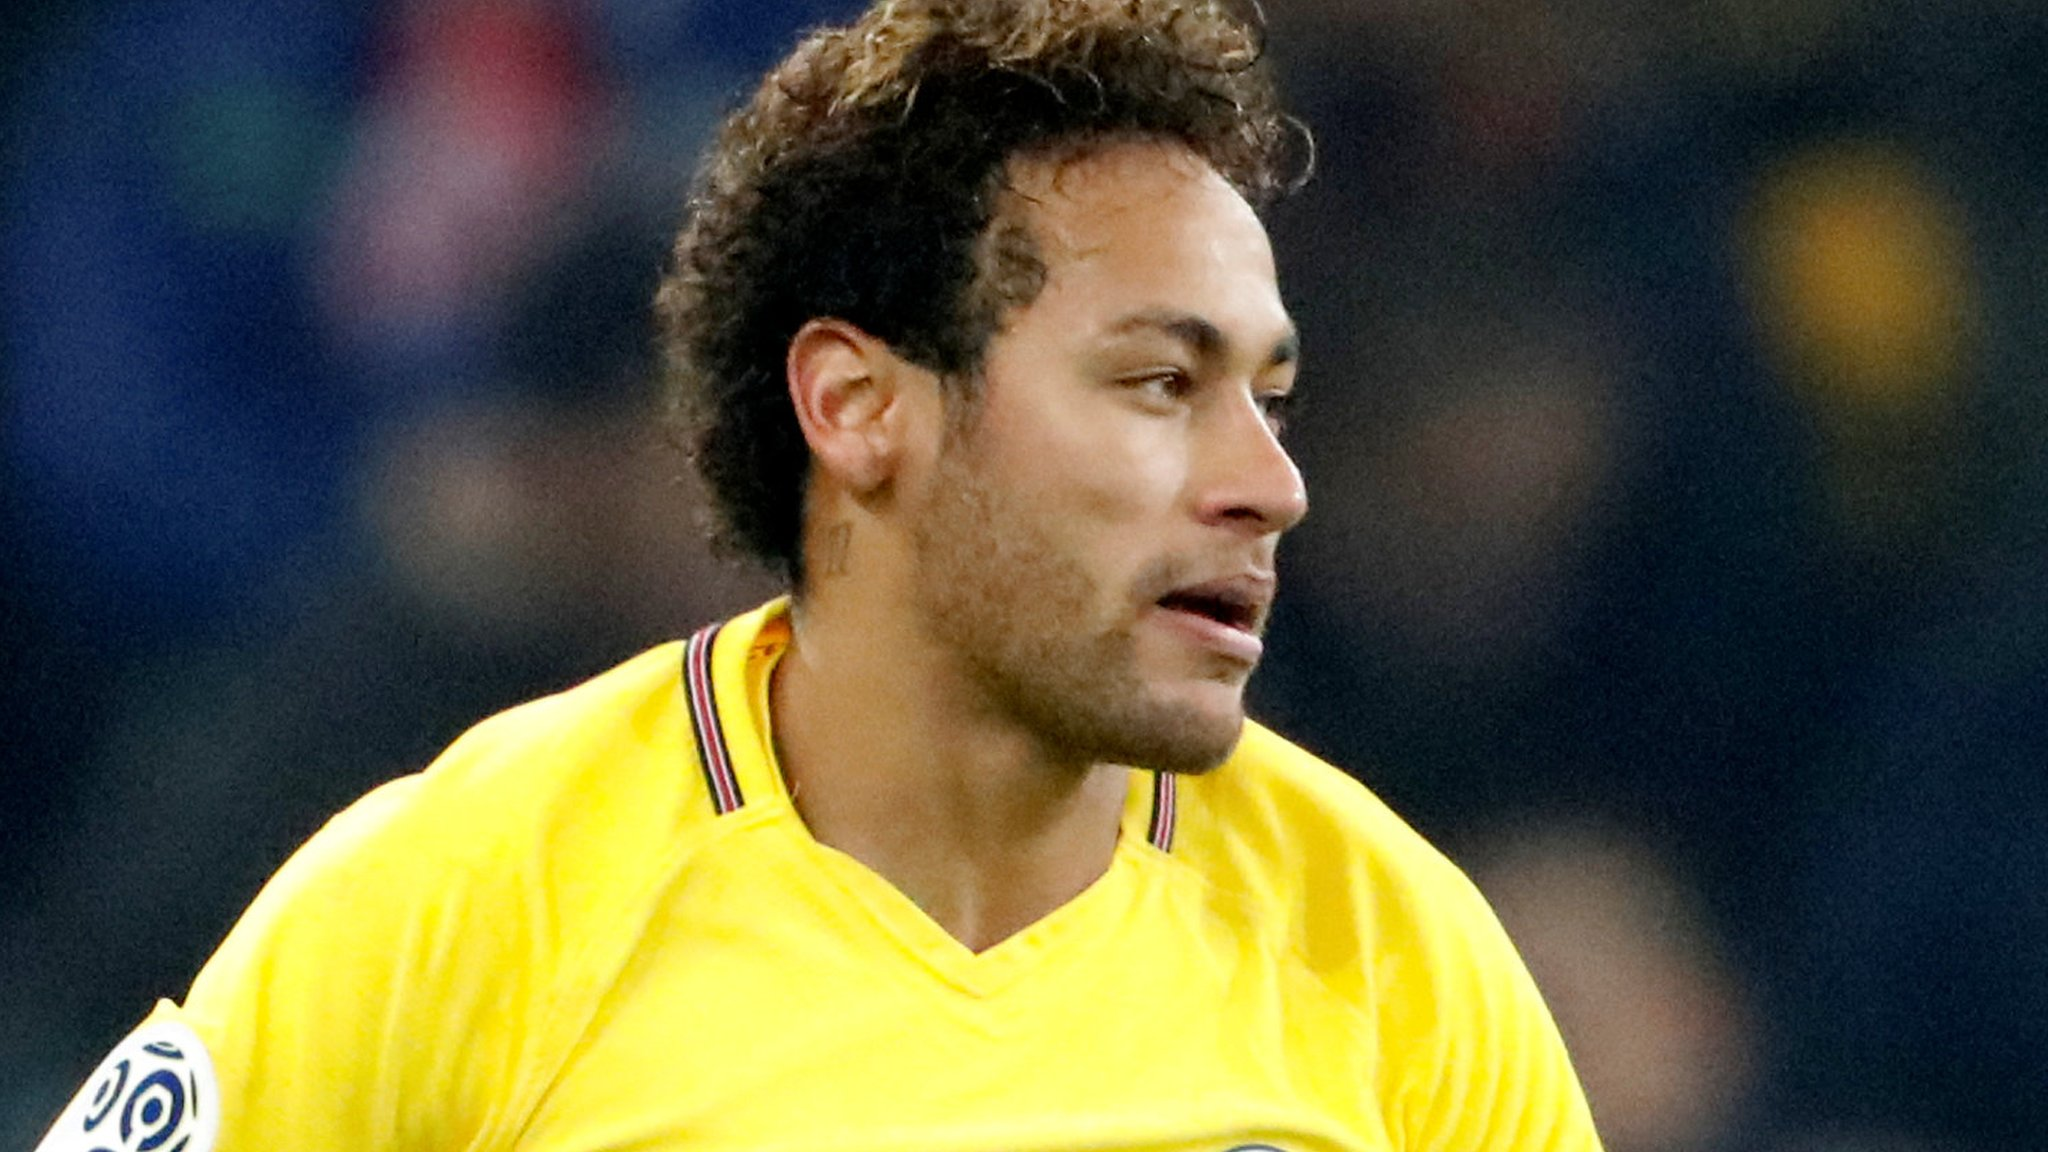 Man City, Man Utd & Real Madrid want Neymar - gossip